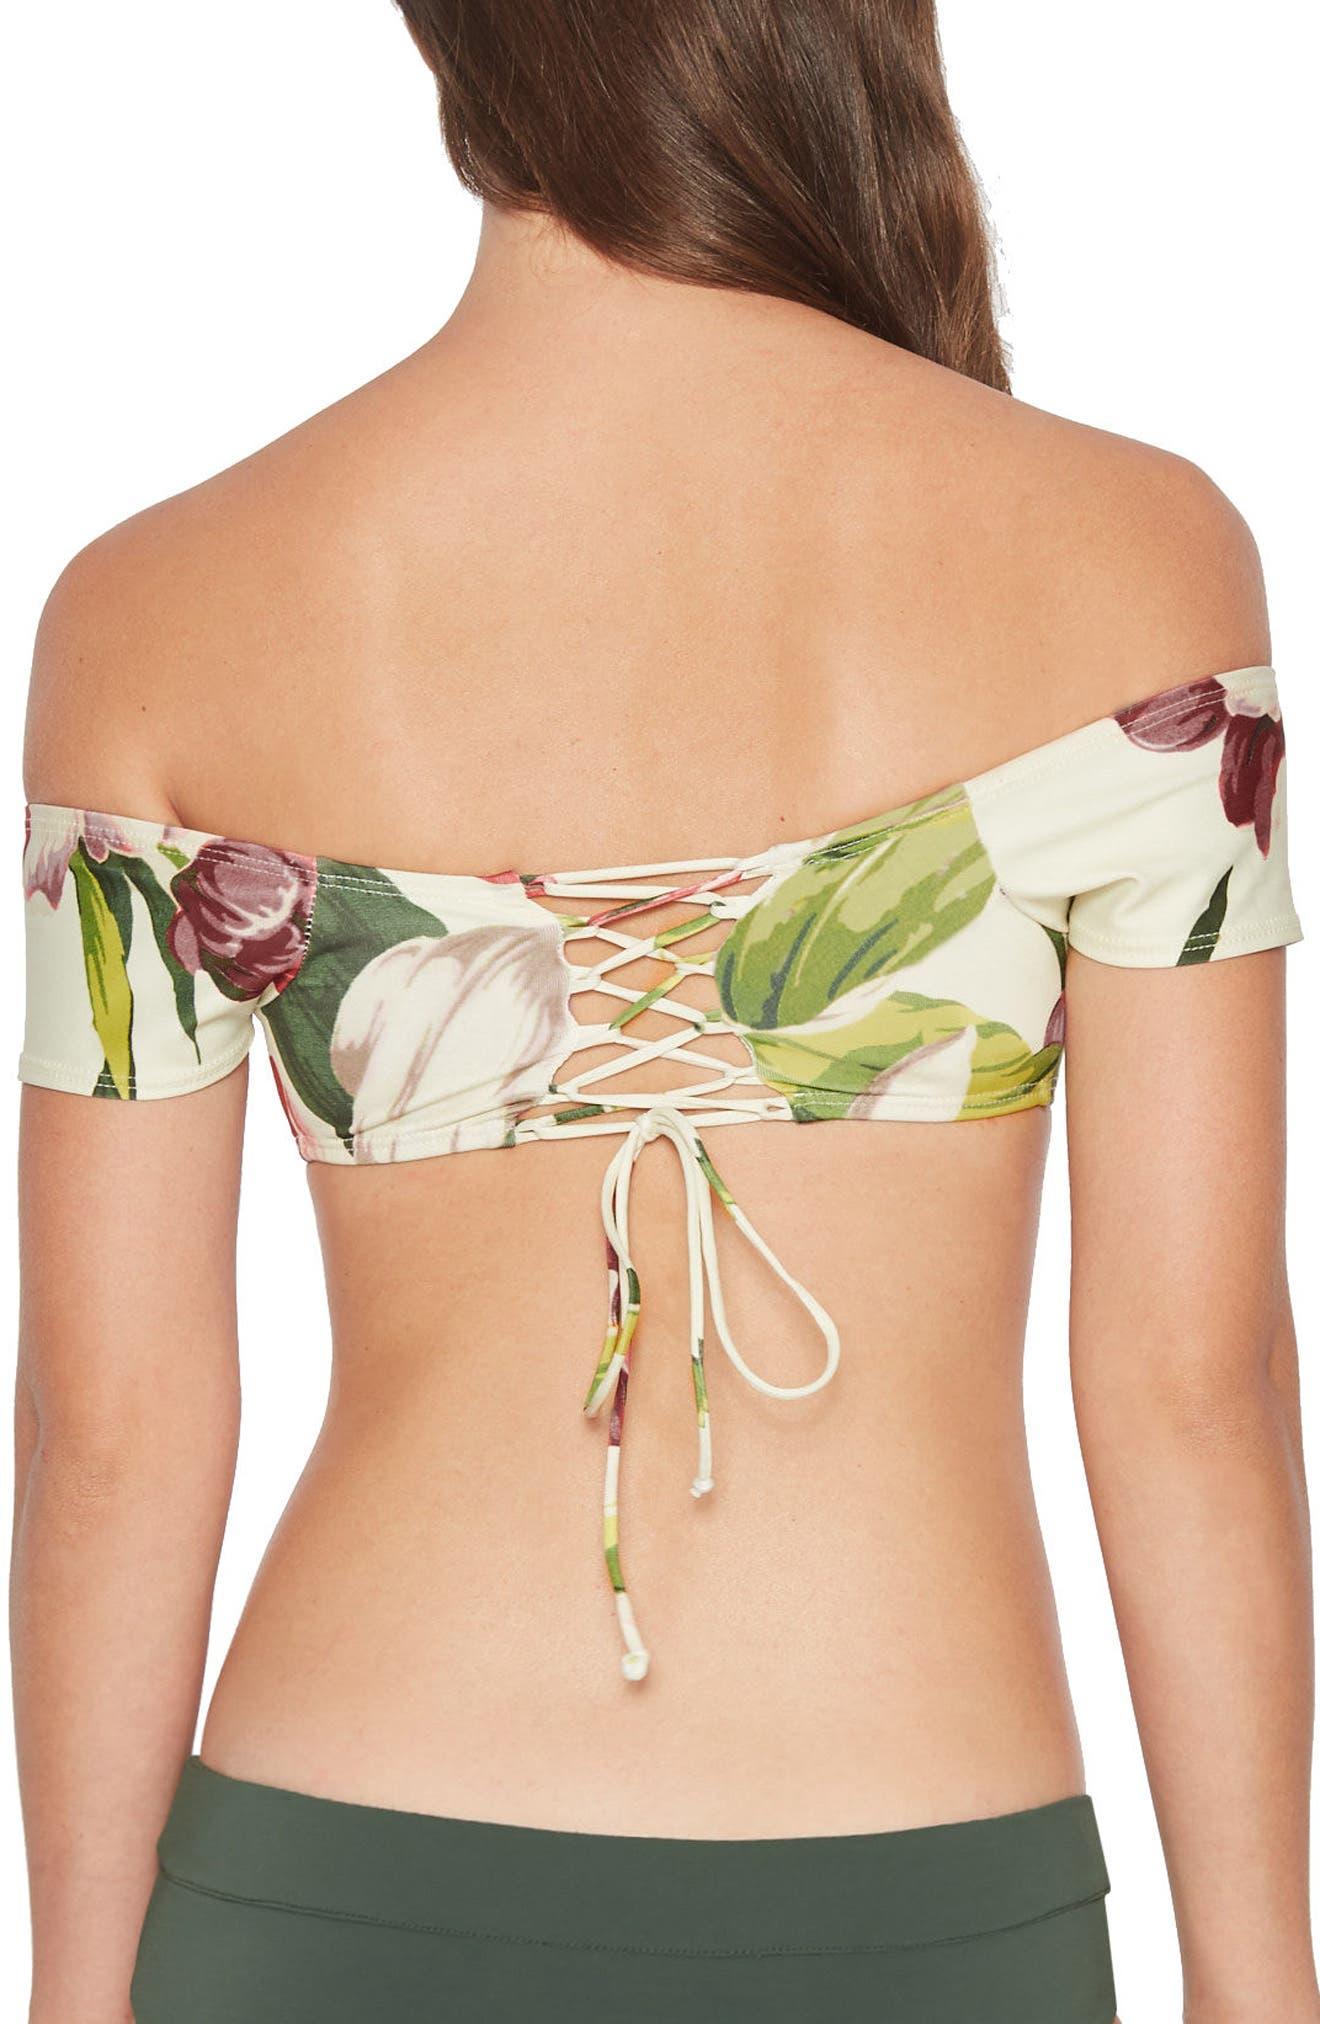 Hawaiian Floral Off the Shoulder Bikini Top,                             Alternate thumbnail 2, color,                             Multi